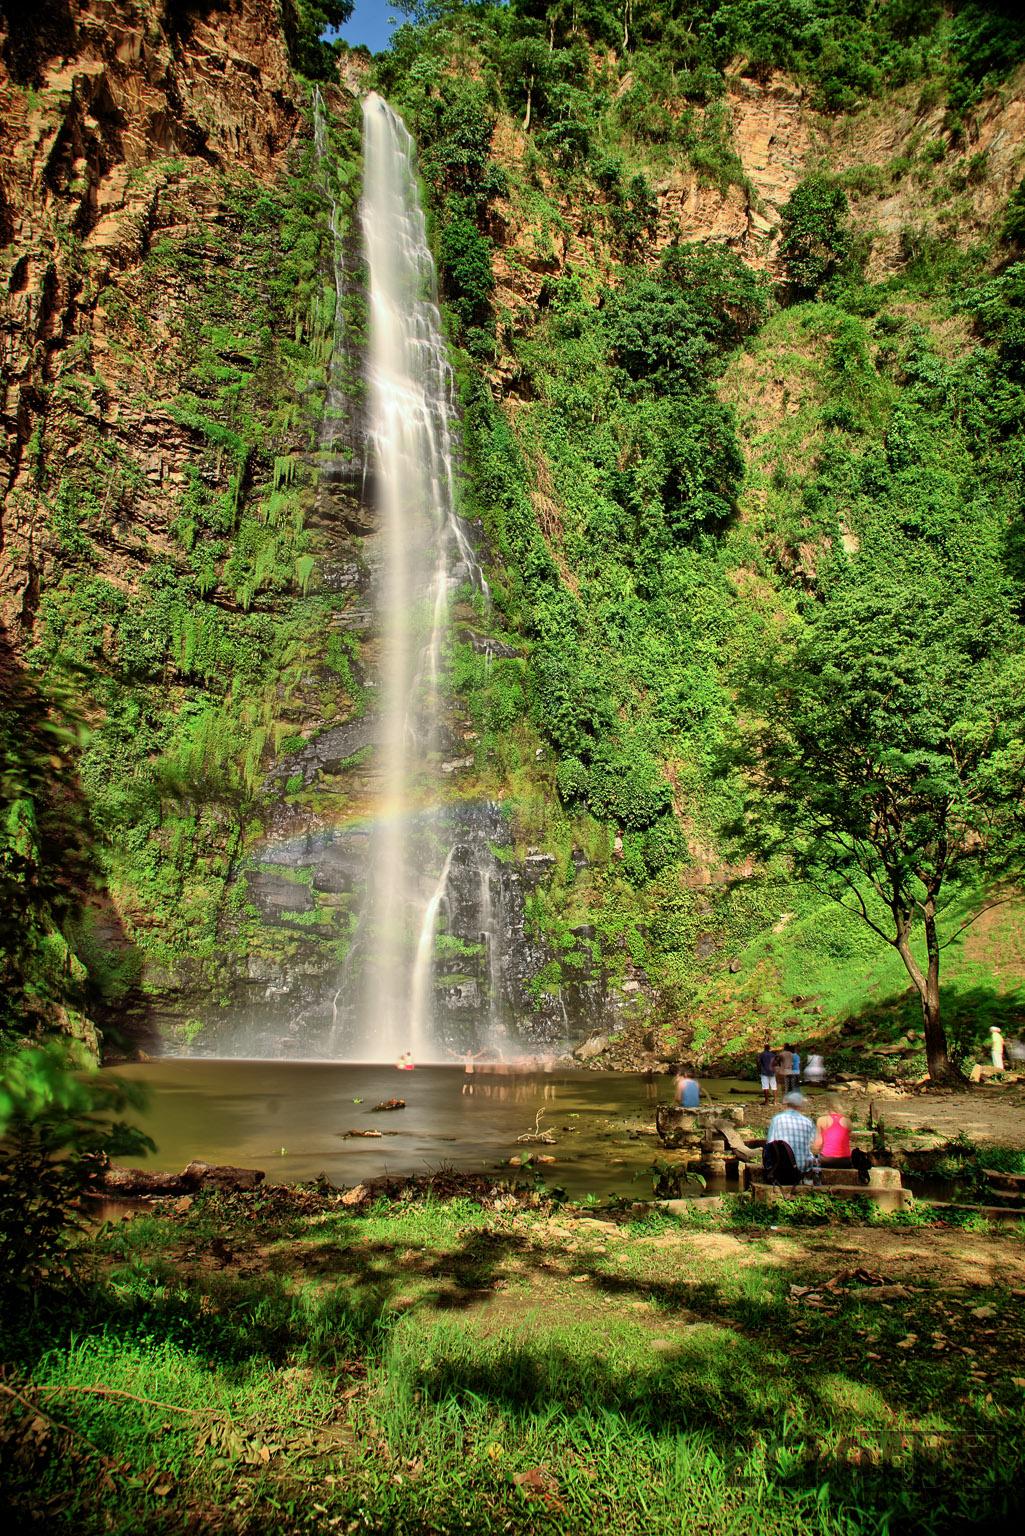 Akosombo Ghana  city pictures gallery : Akosombo Dam and Wli Falls, Ghana | ECHOs By Erik